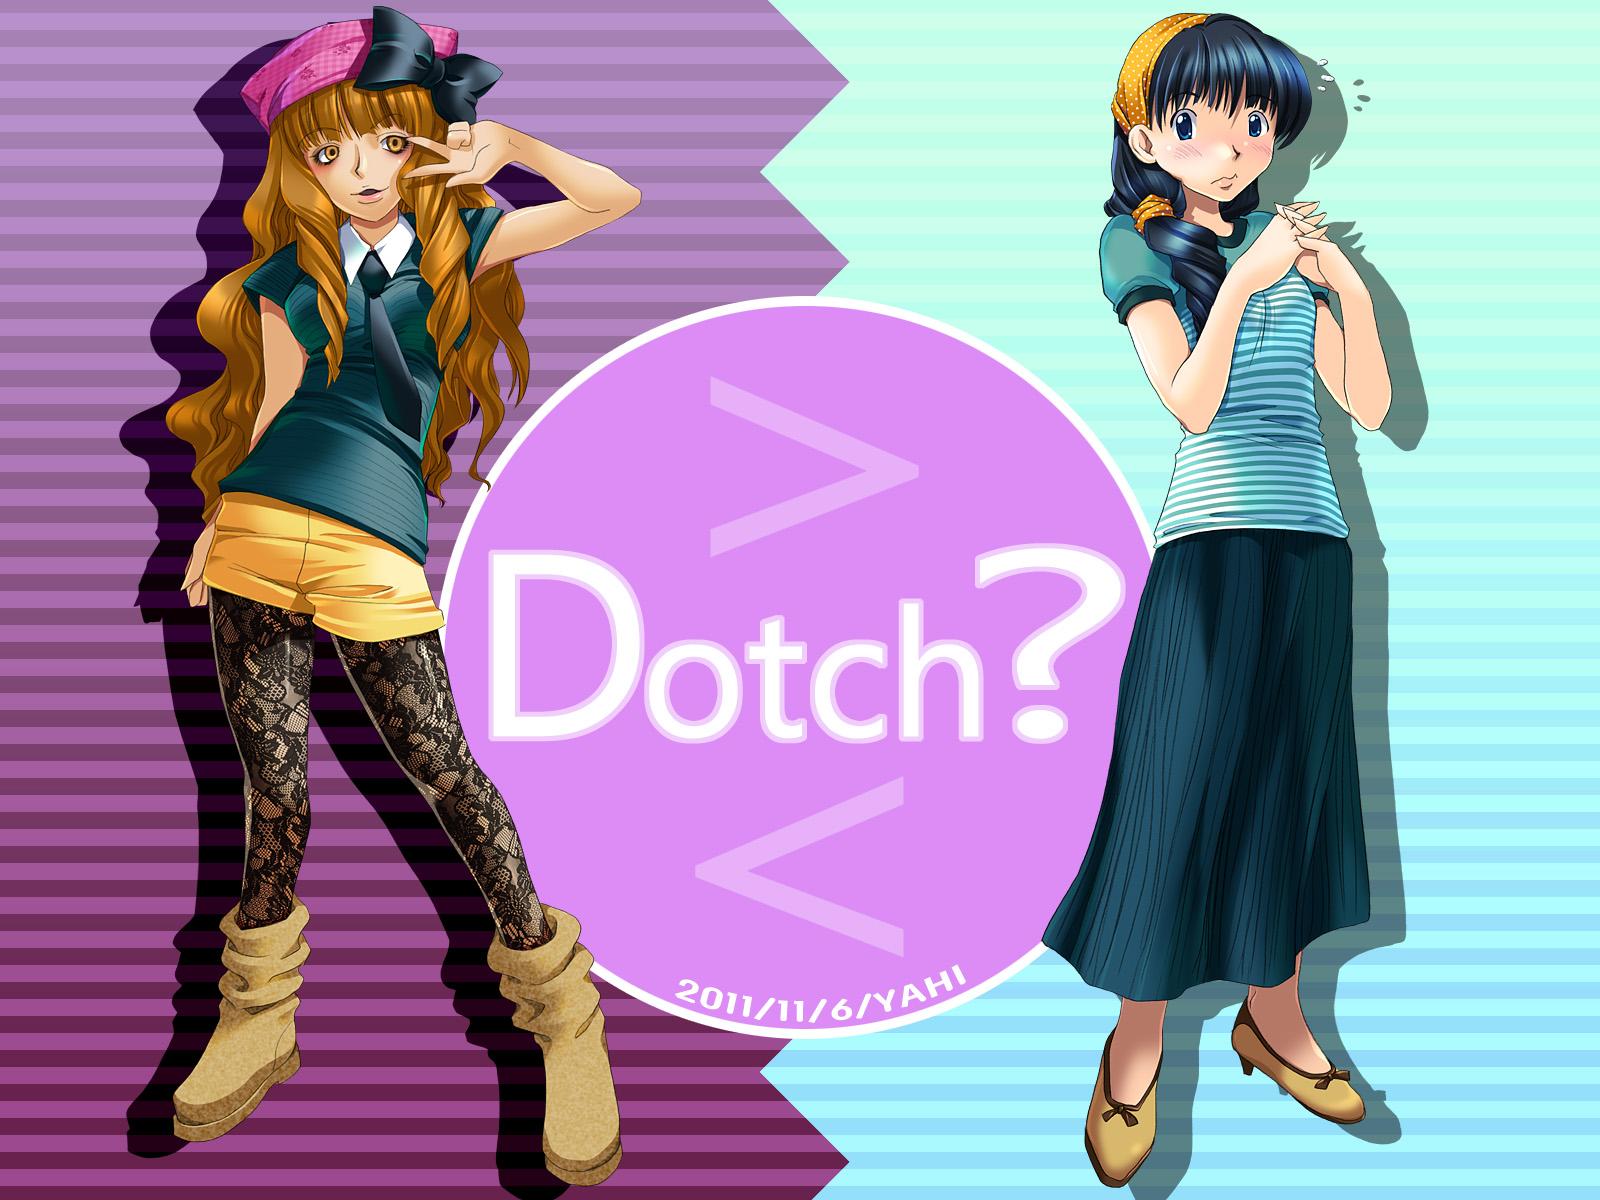 docth.jpg